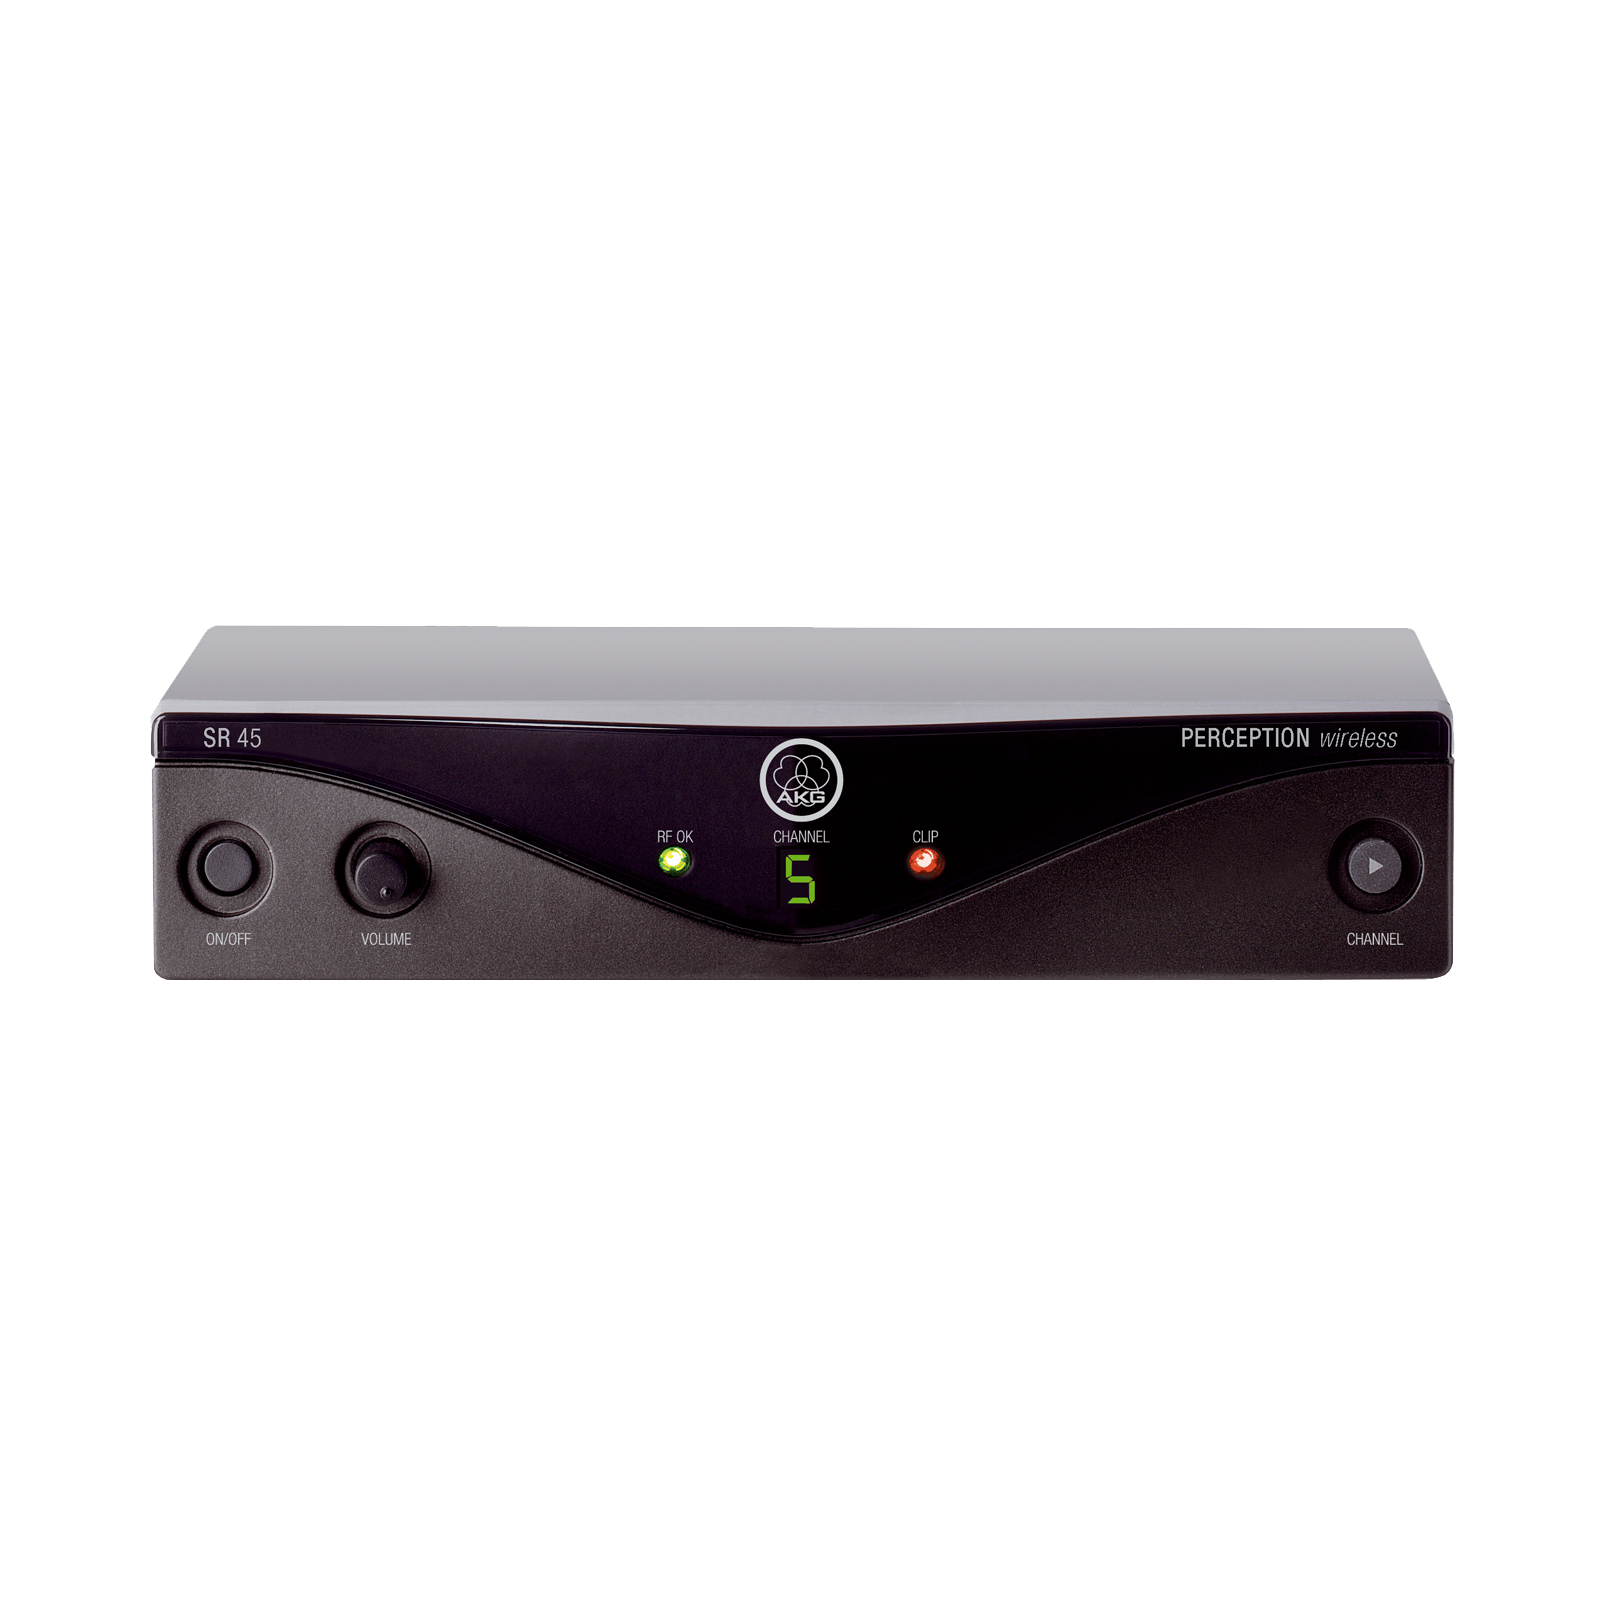 SR45 - Black - High-performance wireless stationary receiver - Hero